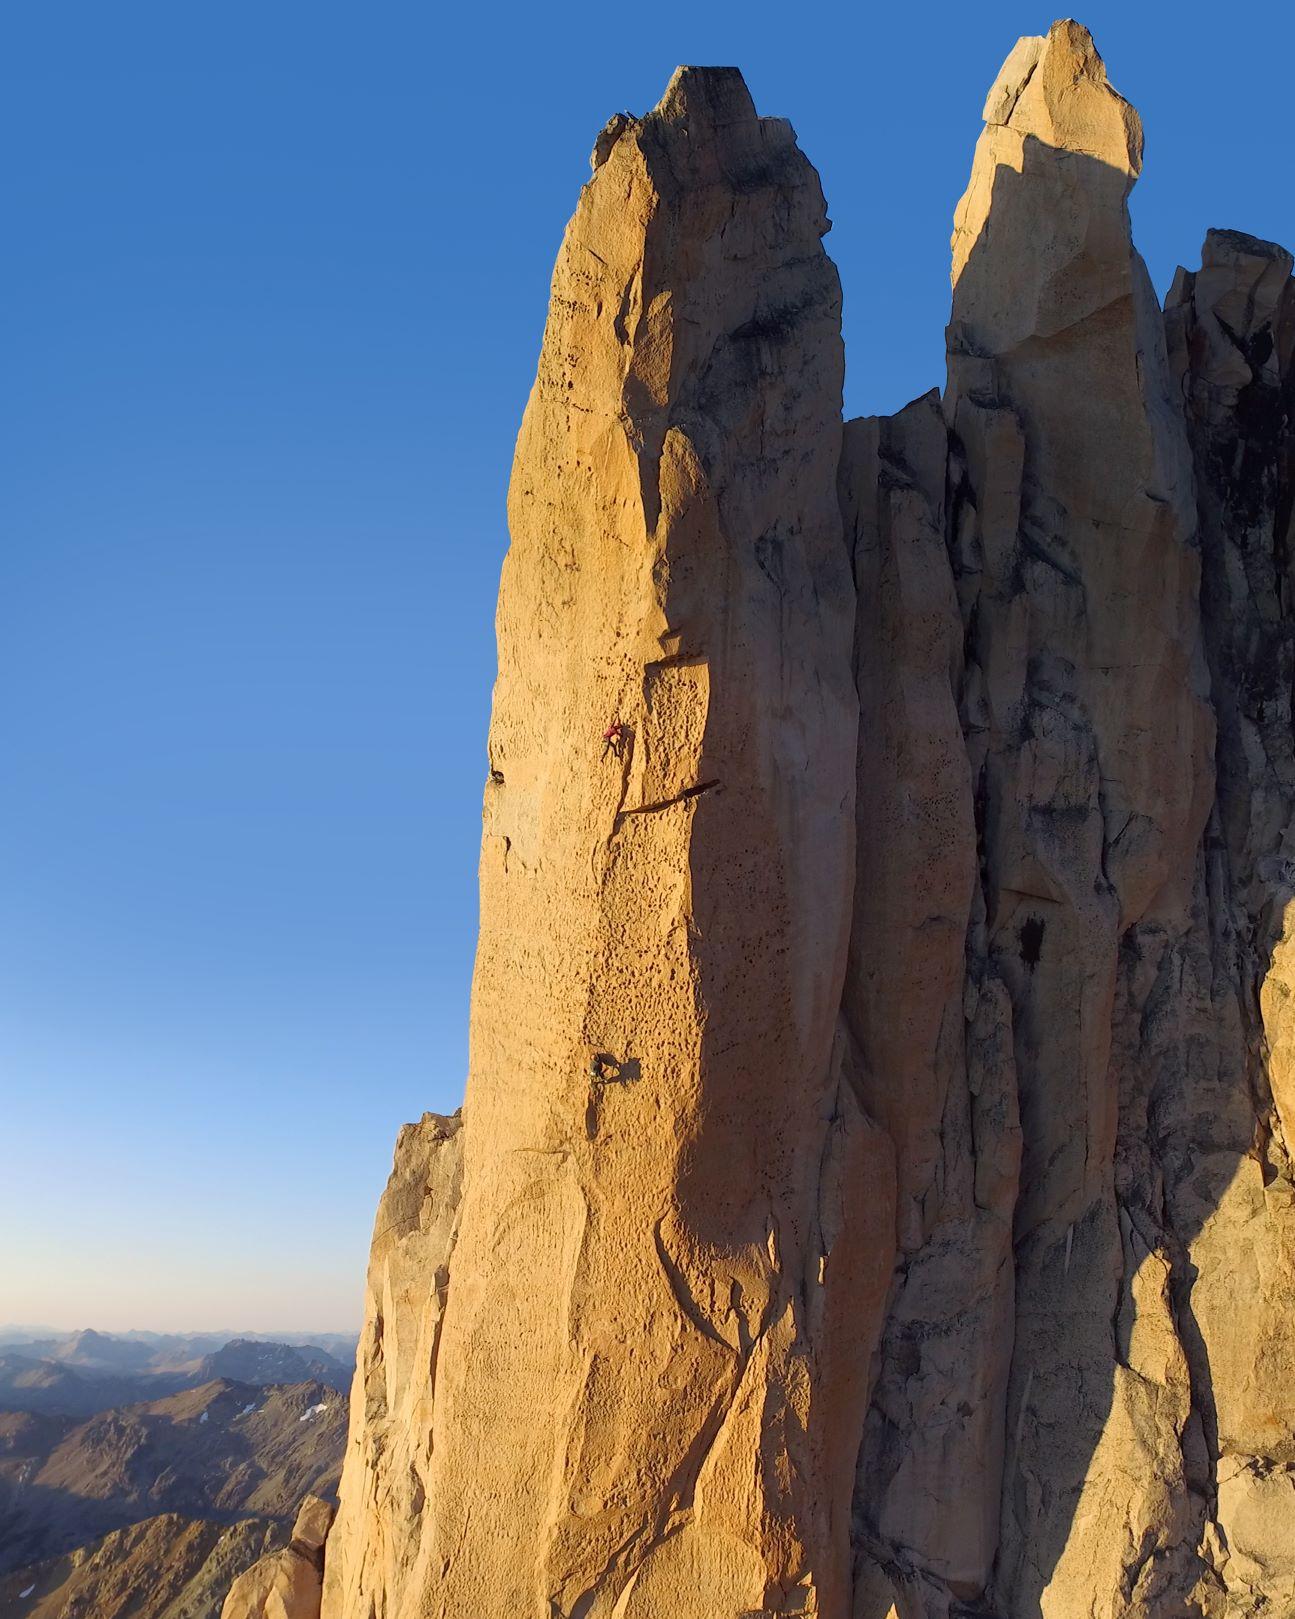 Two people rock climbing on Torre Principal, Frey, Argentine Patagonia